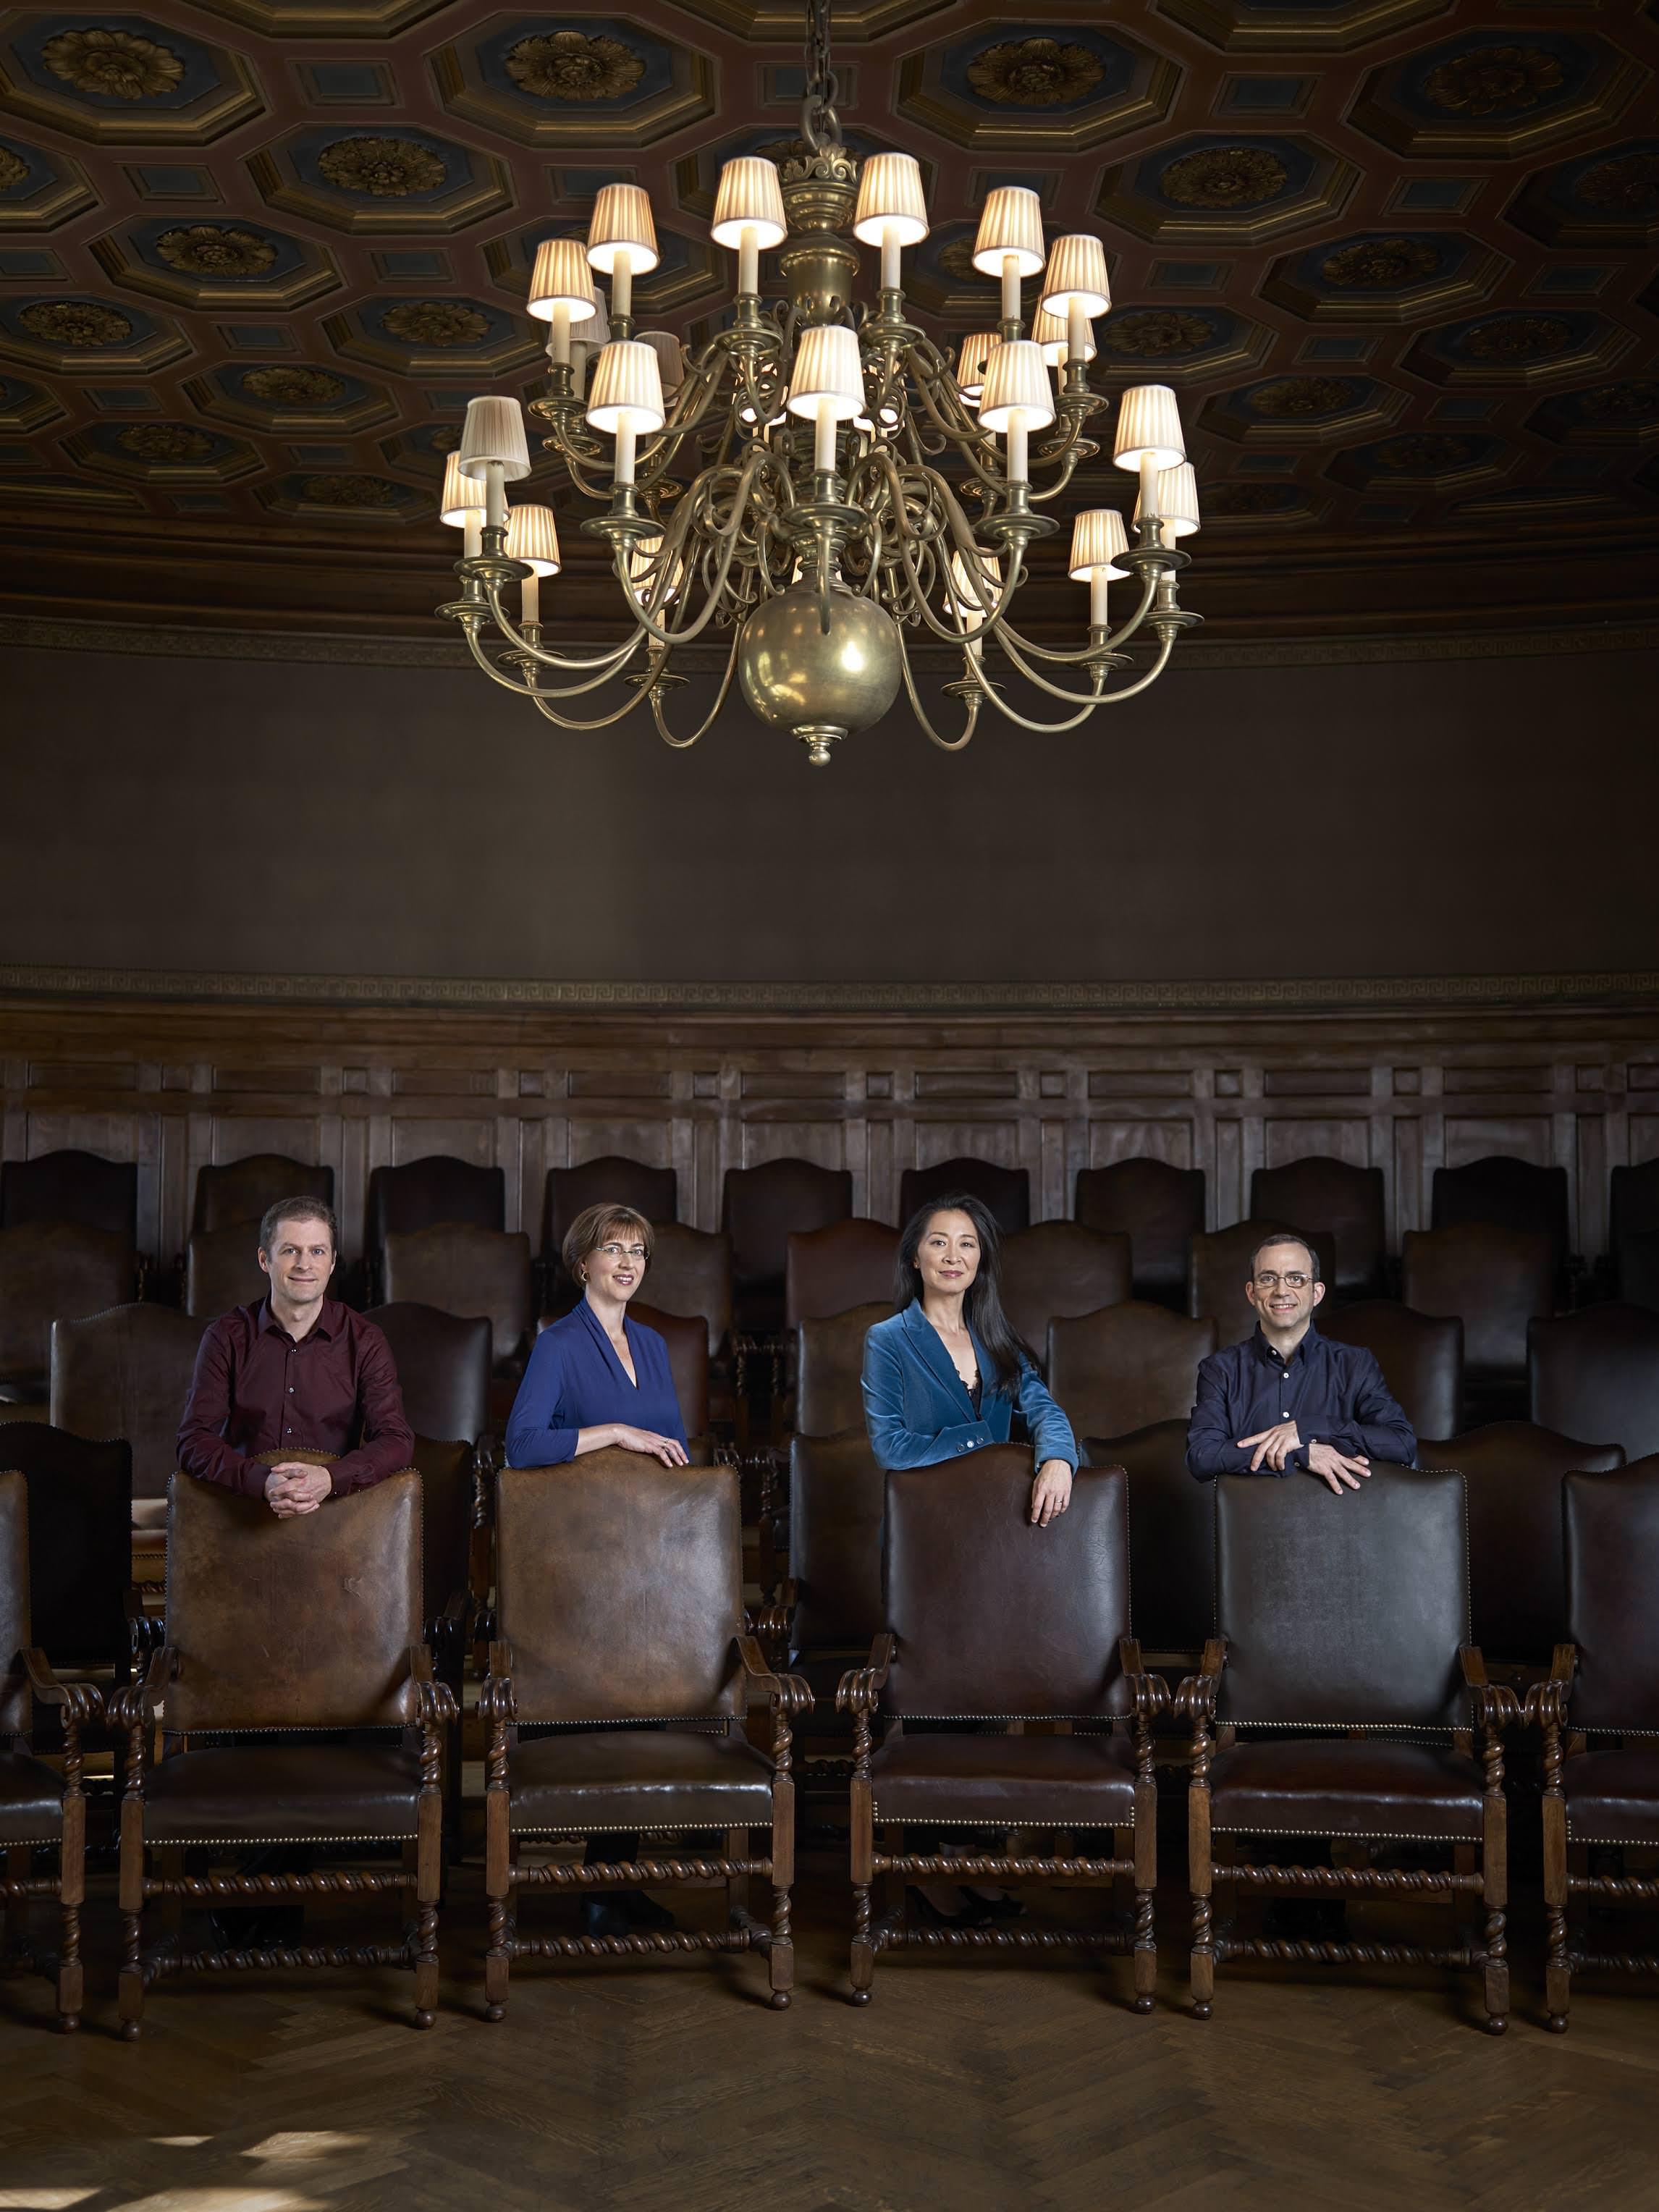 brentano-quartet-by-juergen-frank-2016-07.jpg